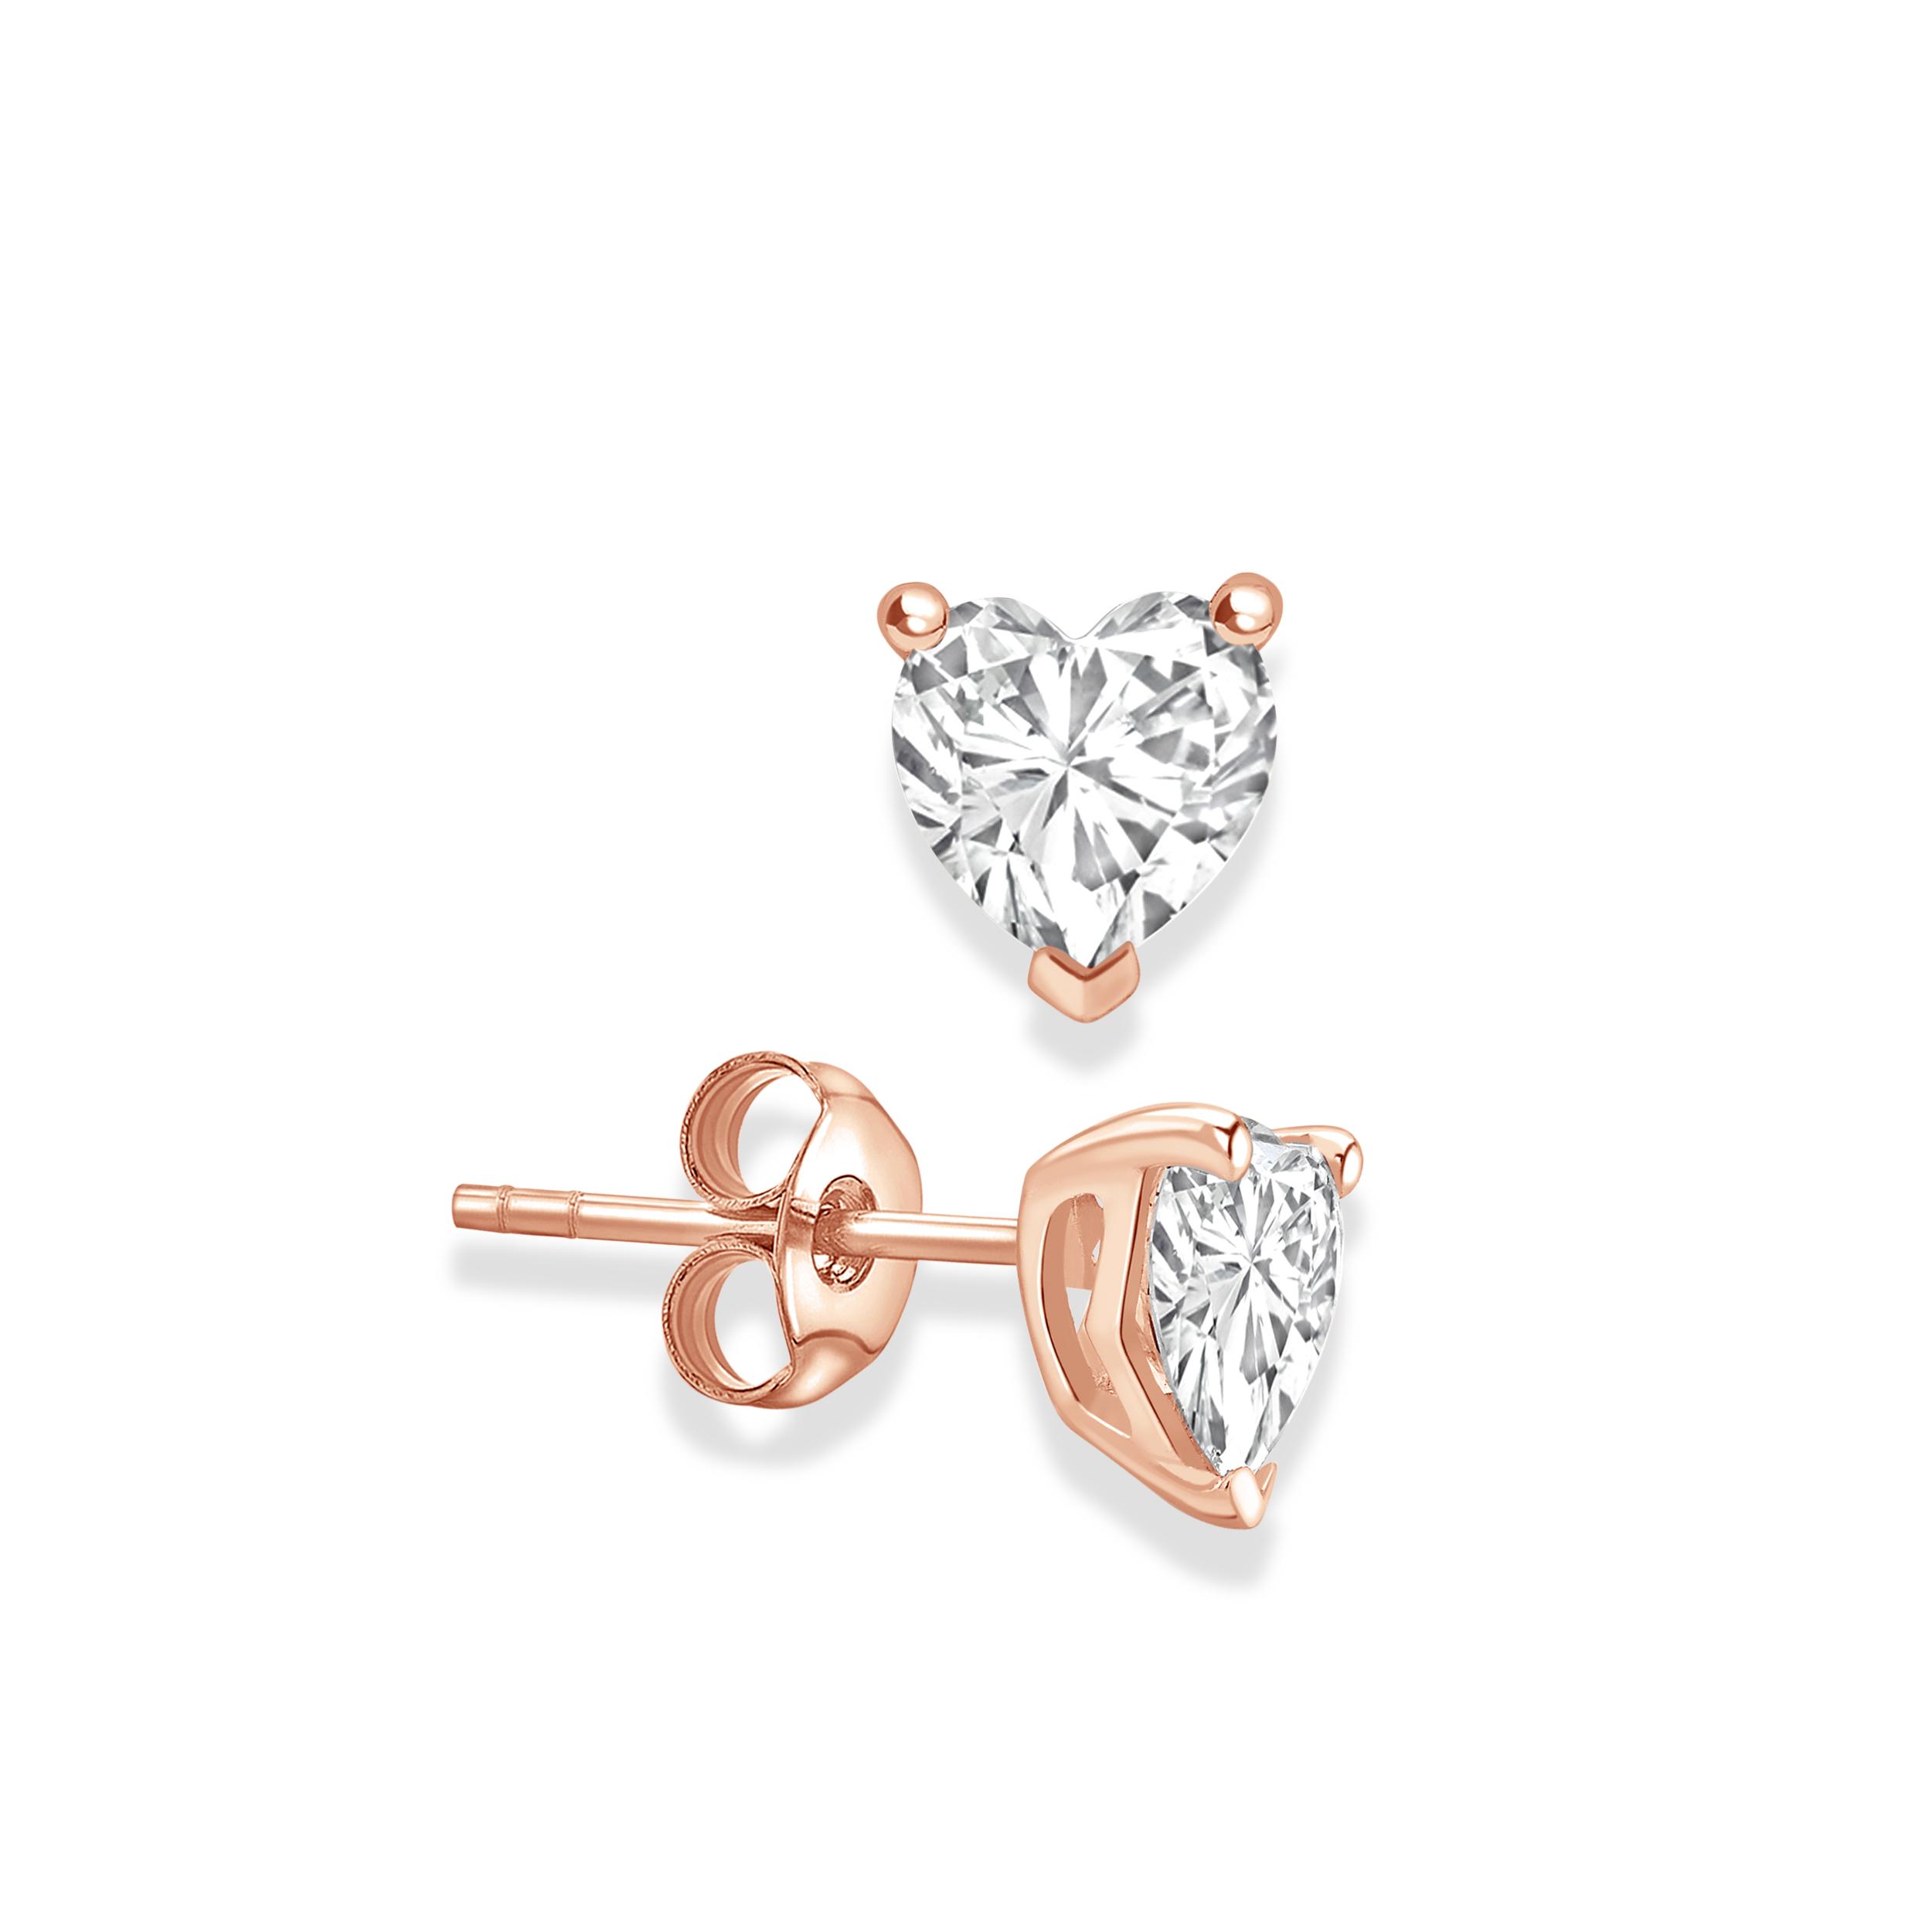 Heart Shape Stud Diamond Earrings Rose, Yellow, White Gold and Platinum